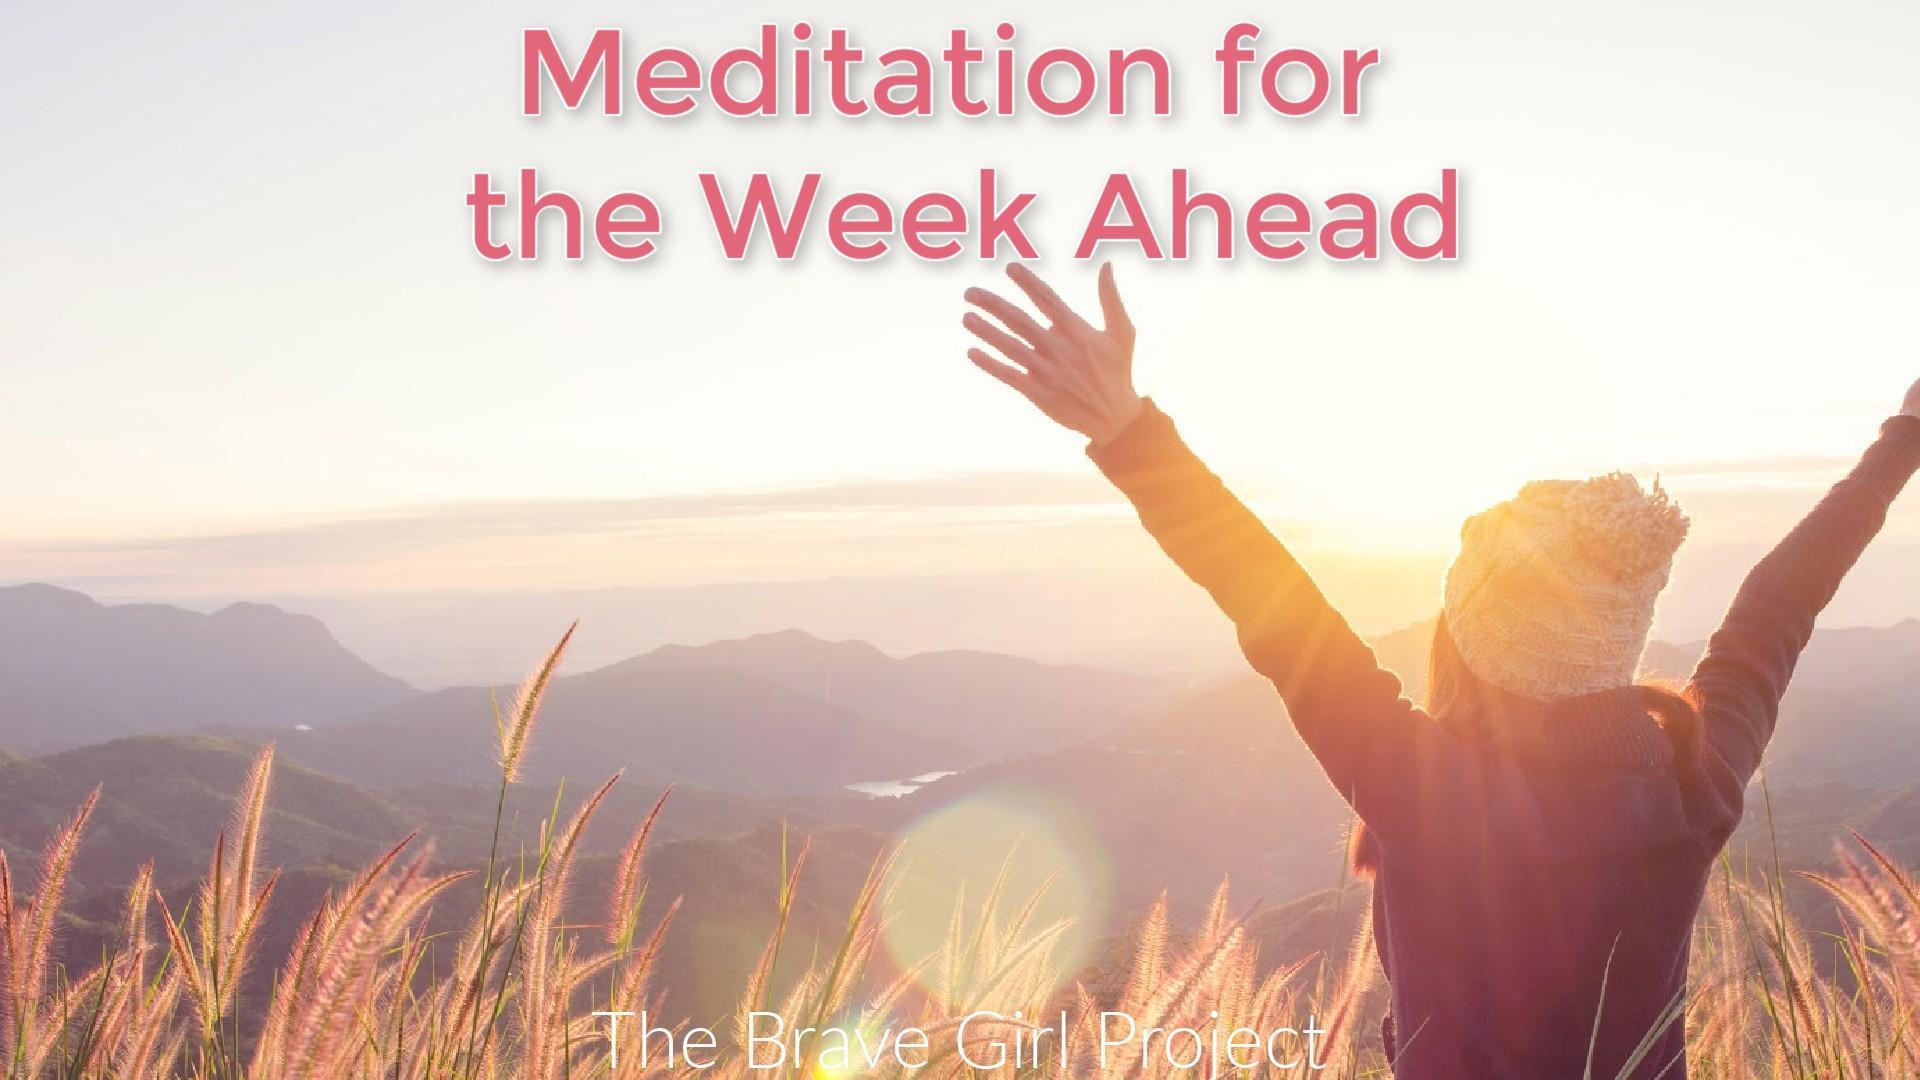 Meditation for the Week Ahead